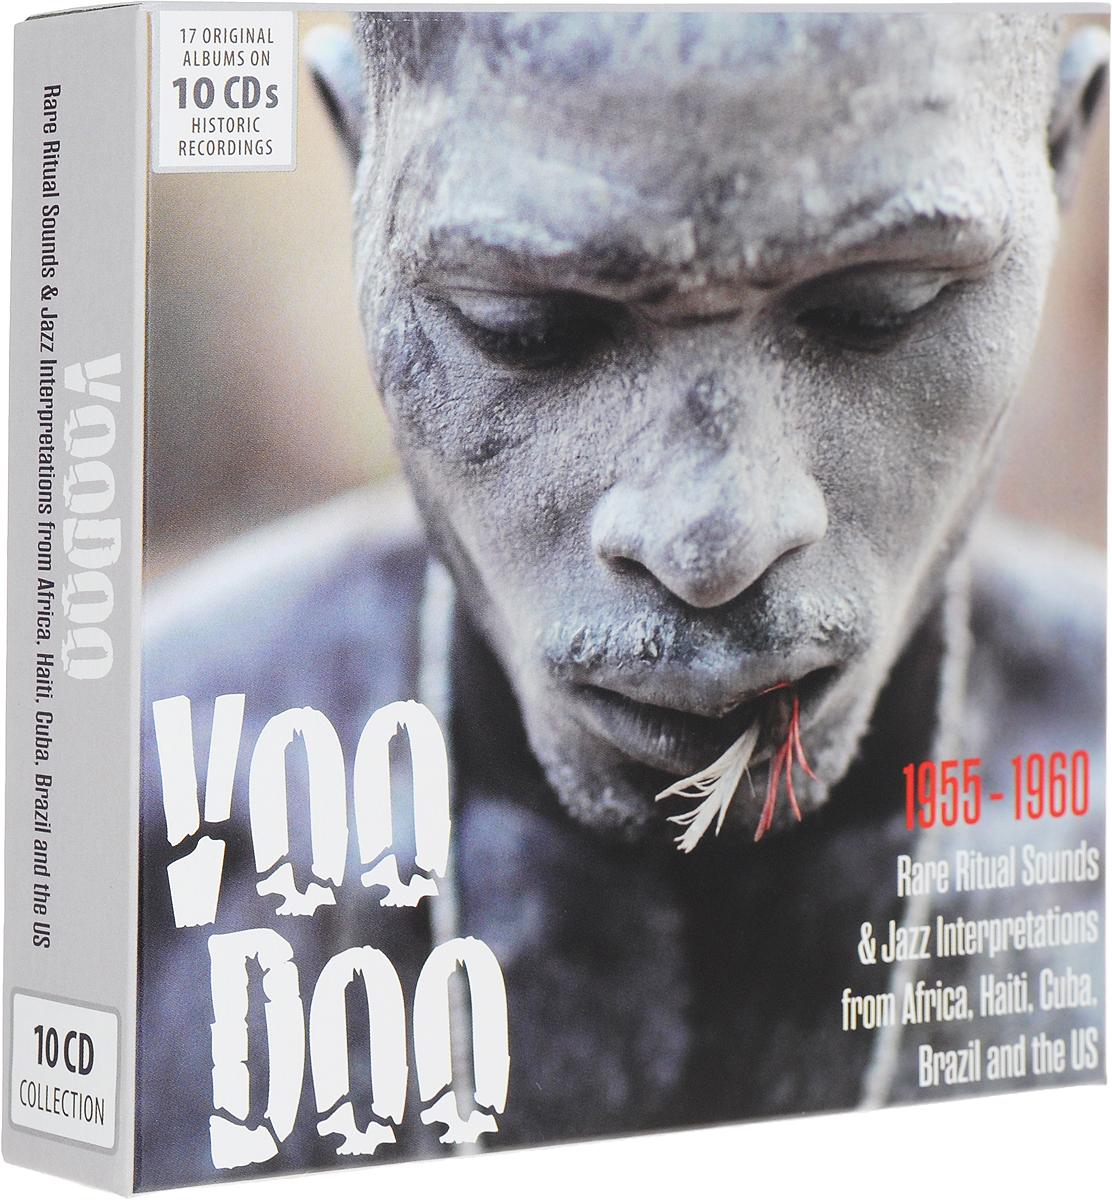 Voodoo. Rare Ritual Sounds & Jazz Interpretations (10 CD) joyce lain kennedy job interviews for dummies